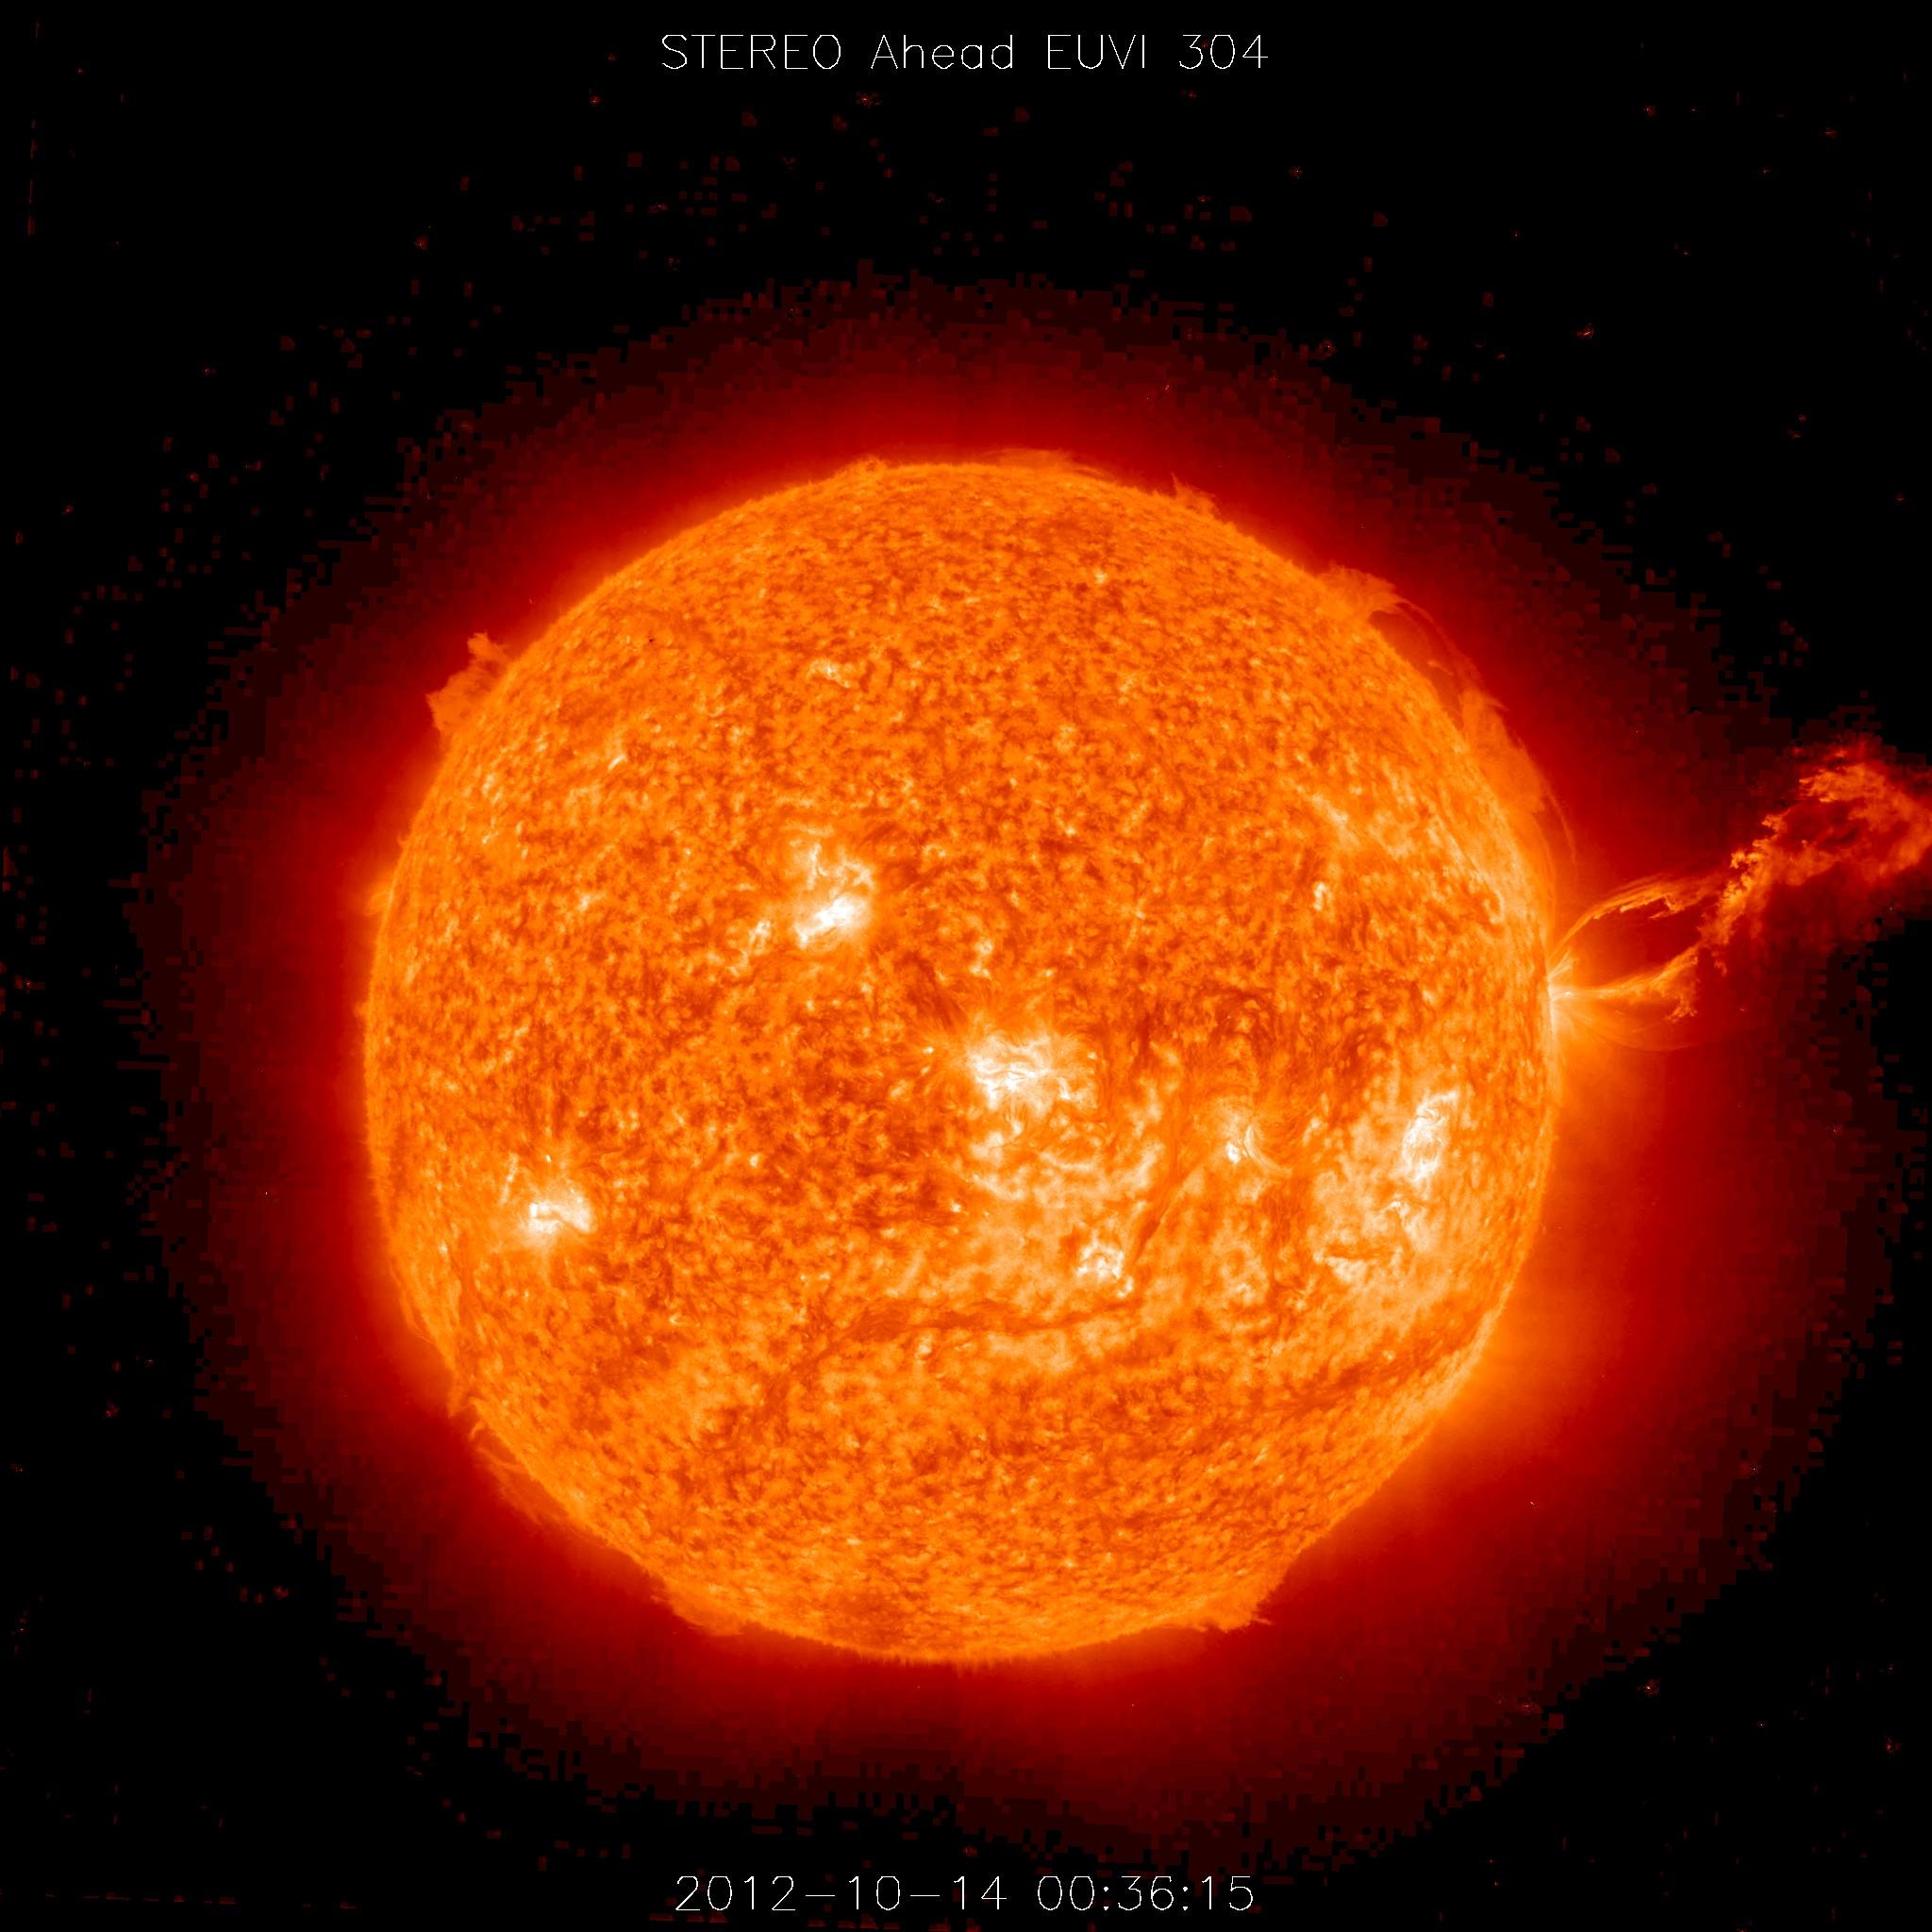 sun texture map nasa - photo #47